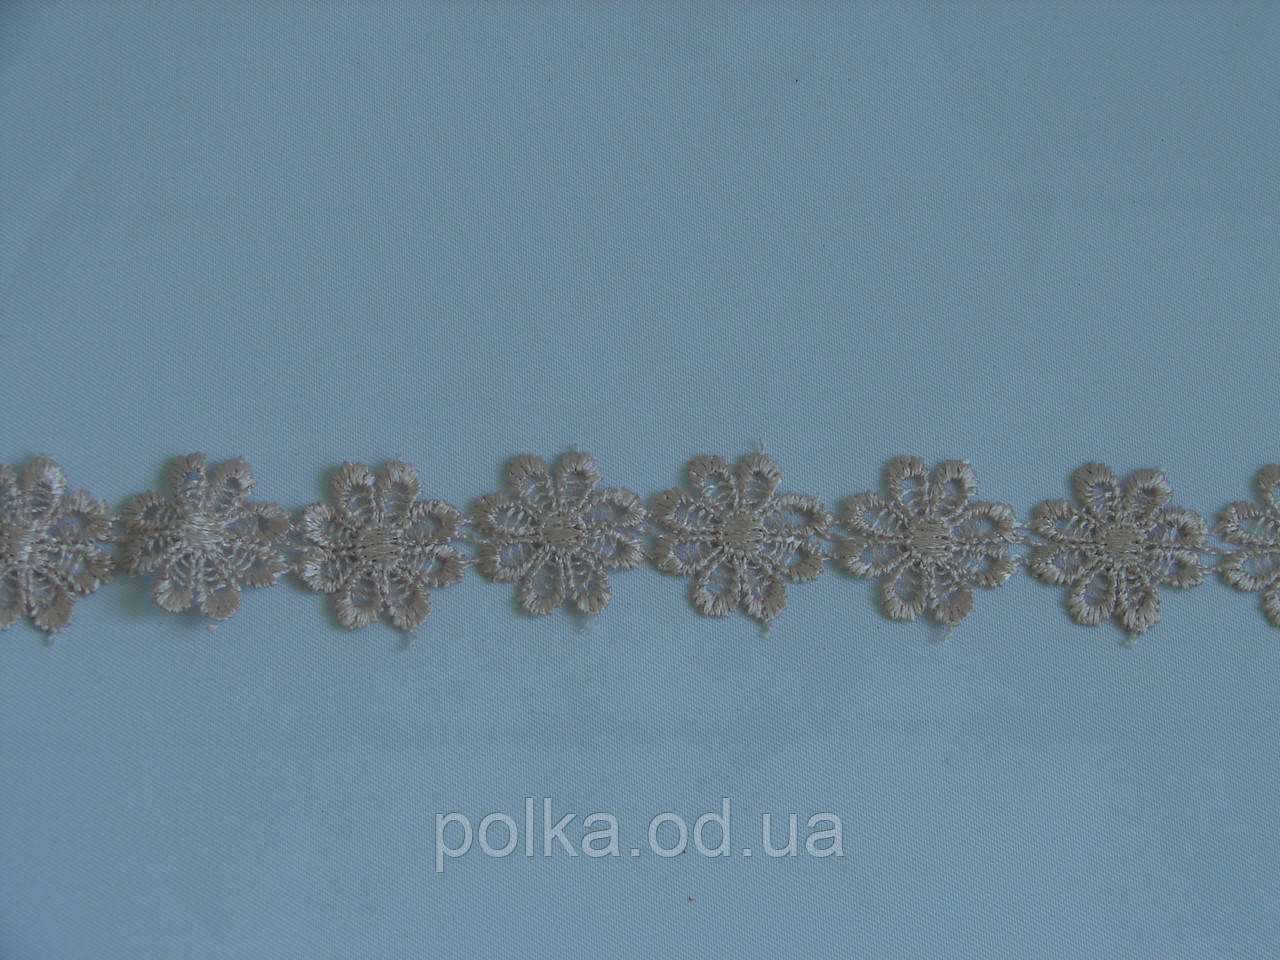 "Кружево ""Ромашка"" светло пудровое, диаметр 1 цветка 2,5 см,(1 упаковка 15ярдов=13.8м)"